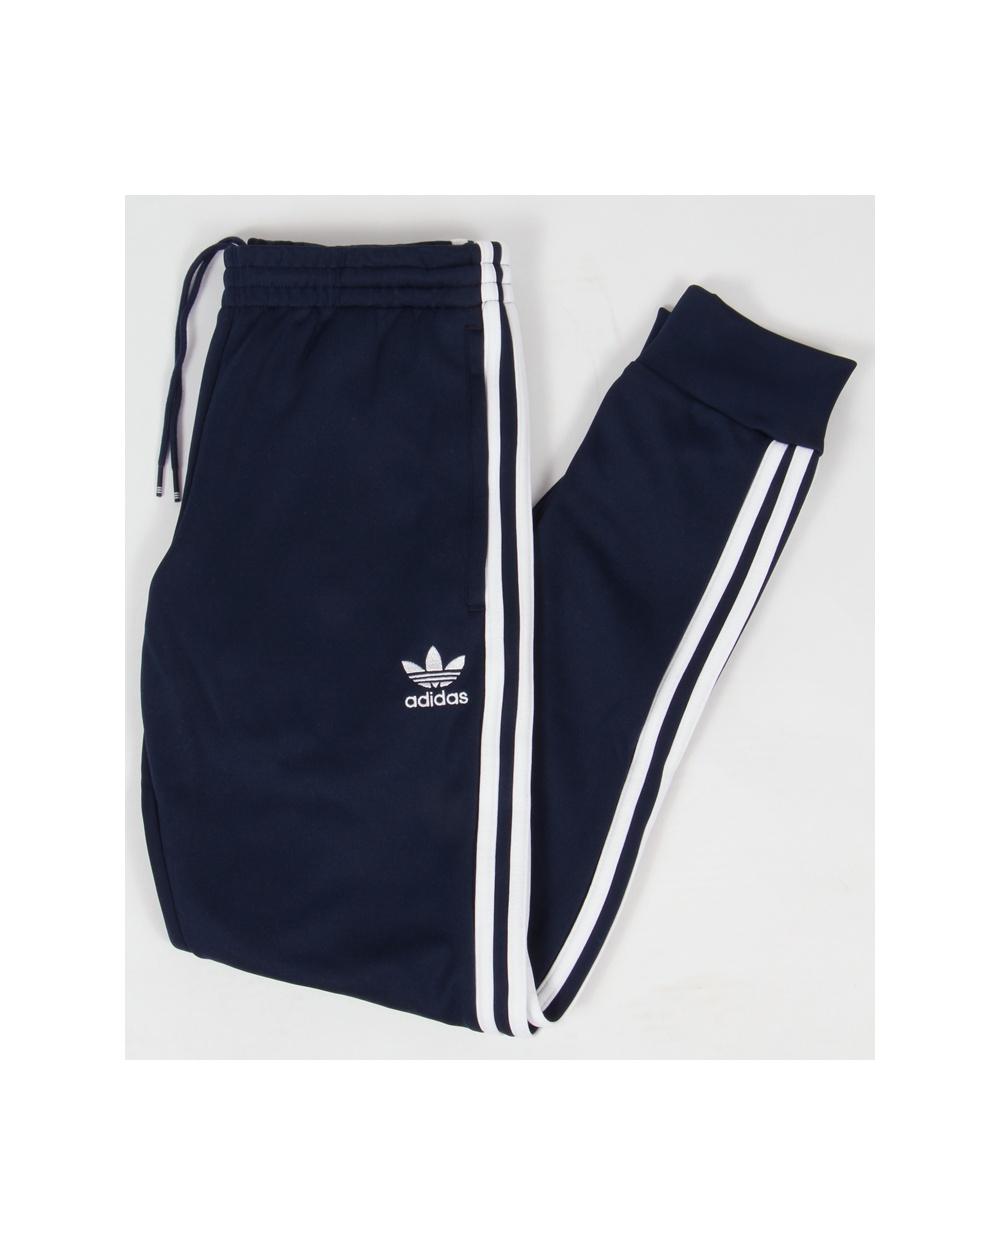 527ac78d8 adidas - Superstar Cuffed Track Pants Black AJ6960; Adidas Originals  Superstar Cuffed Track Bottoms Navy Blue